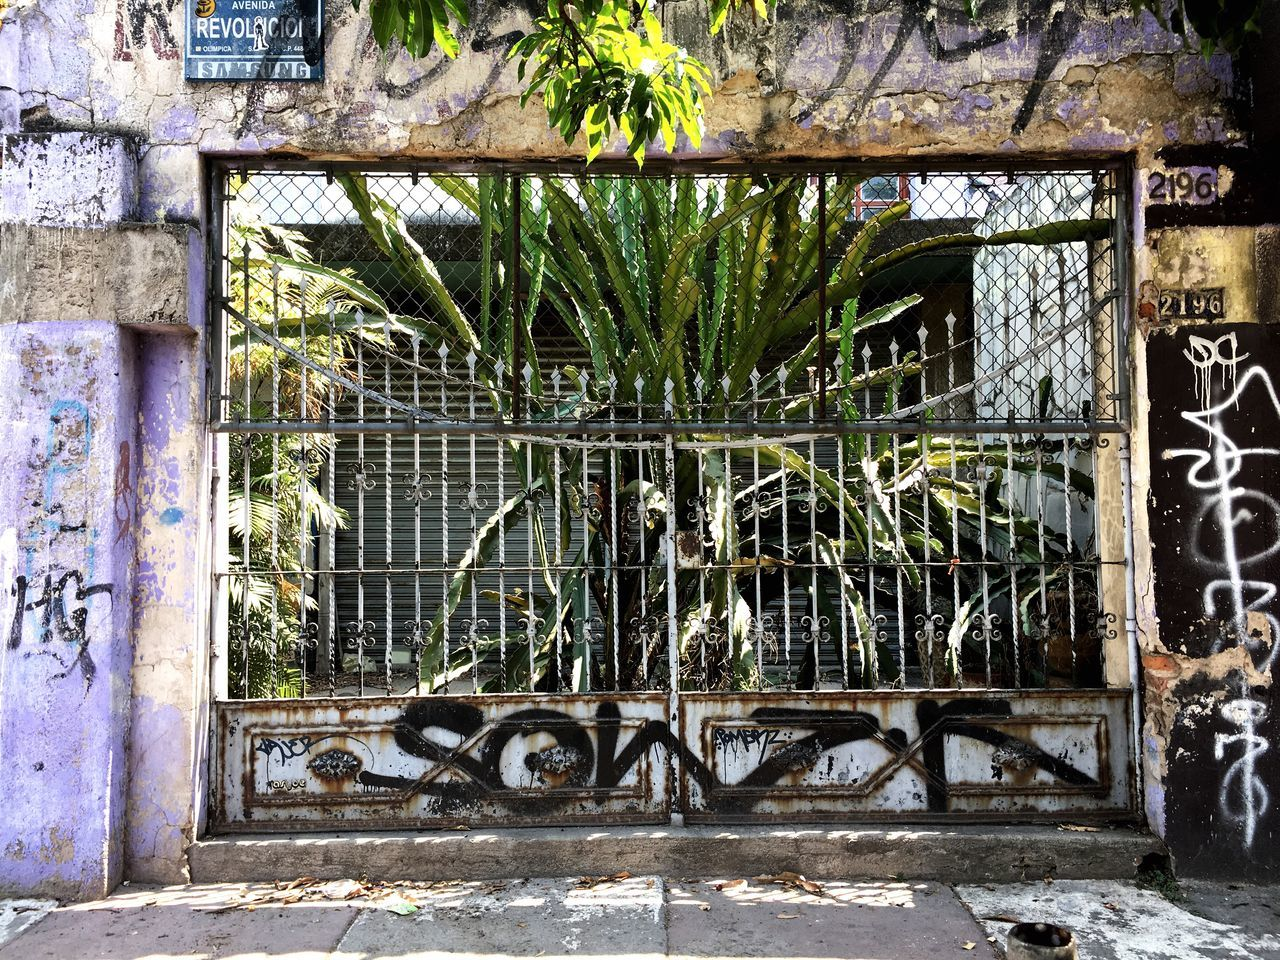 Disfrutando De La Vida Graffiti Architecture Built Structure Abandoned No People Building Exterior Outdoors Window Day Walking Around Walking Alone... Walking Around Taking Pictures